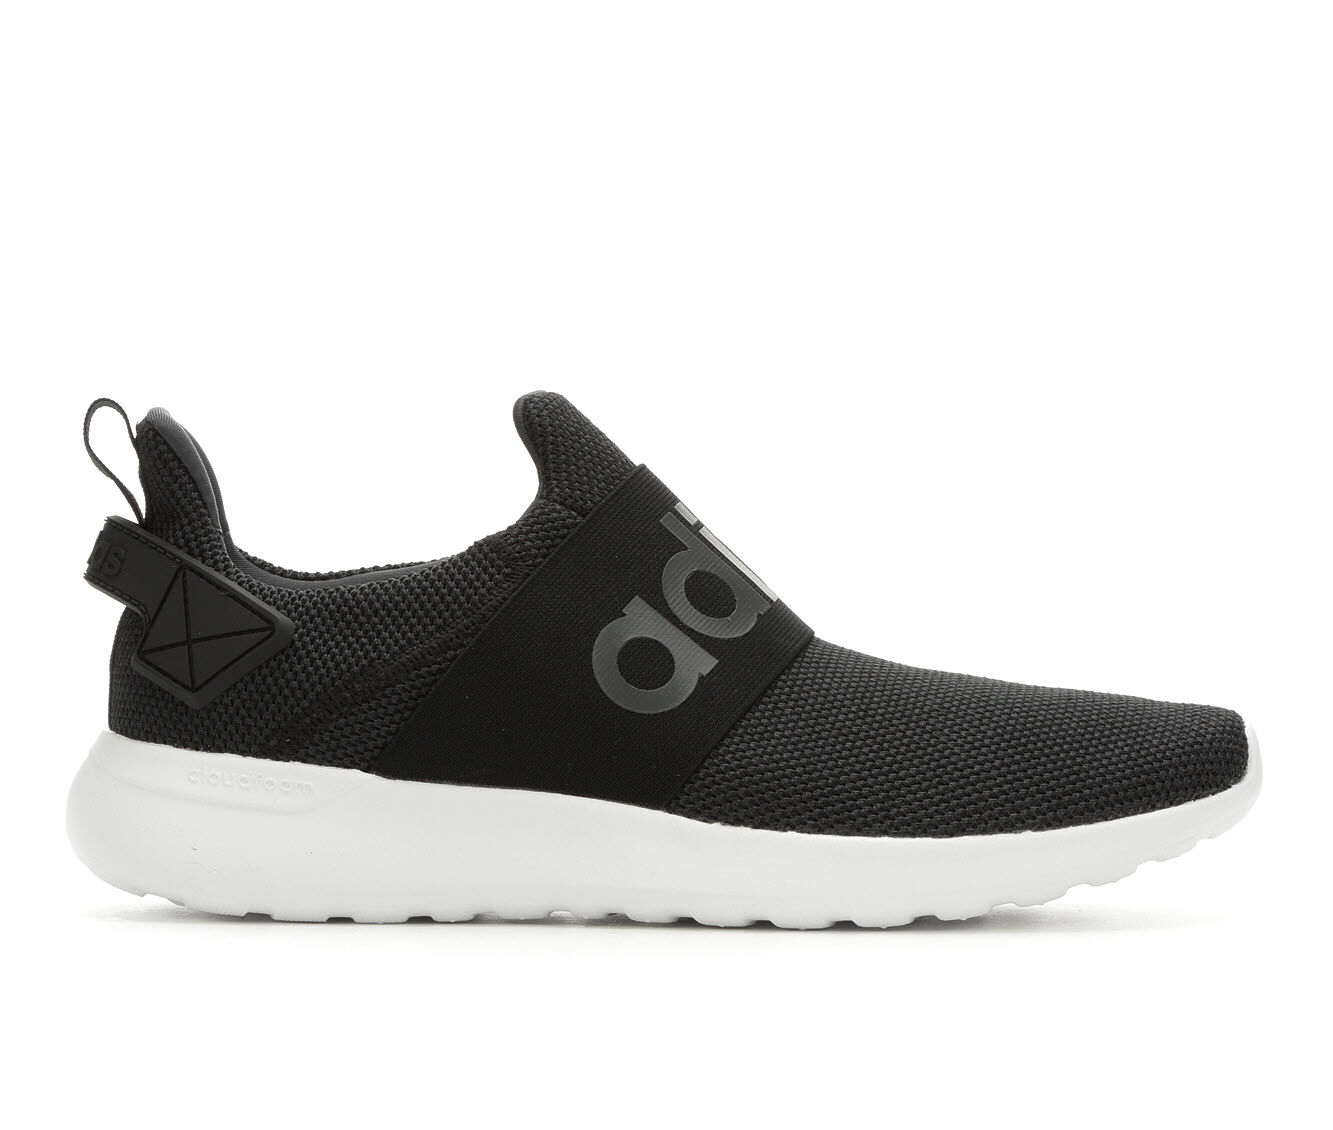 uk shoes_kd1814